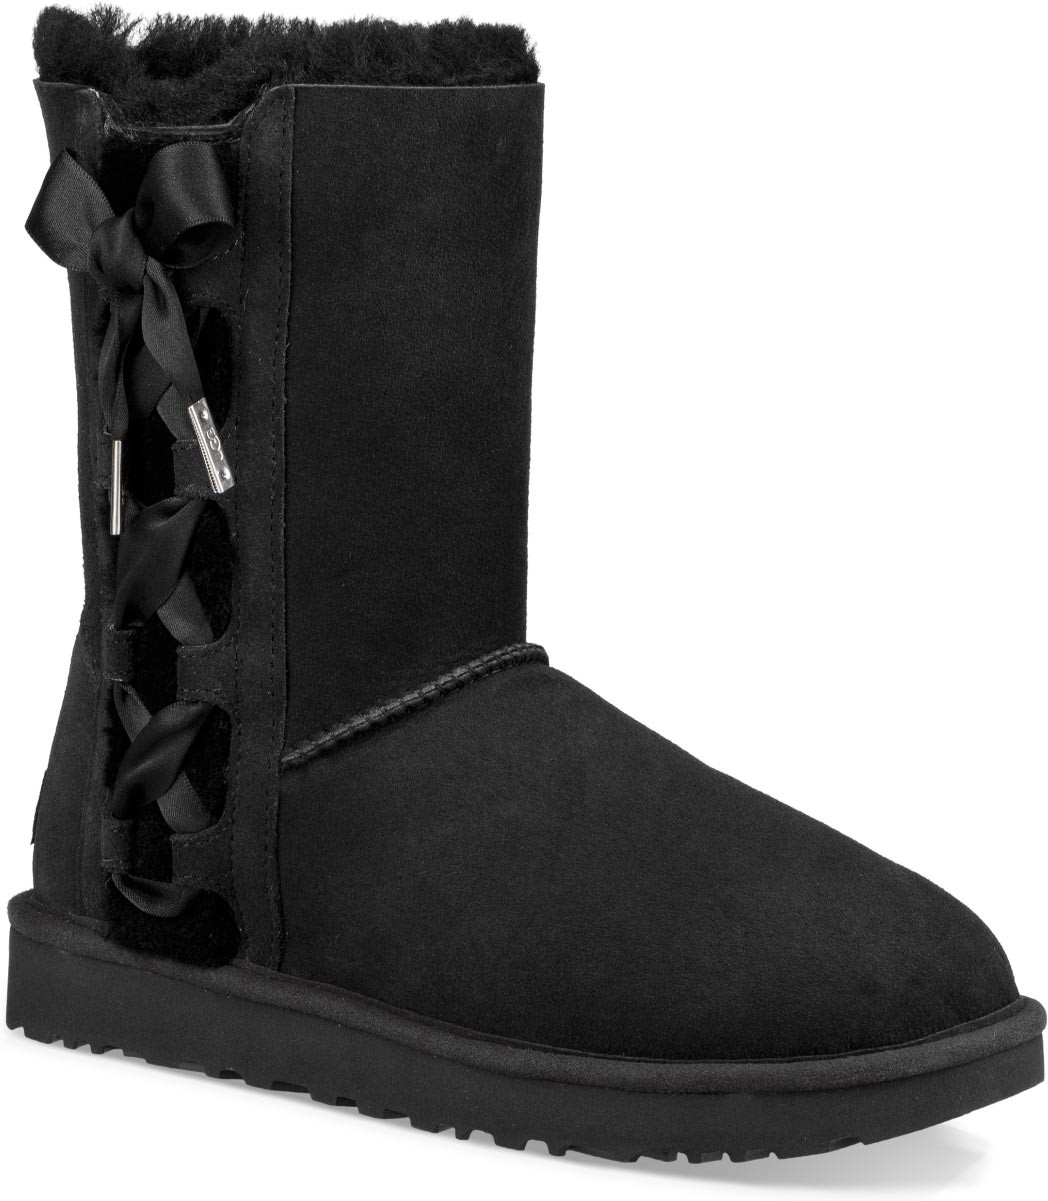 ... Boots; UGG Women's Pala. Black